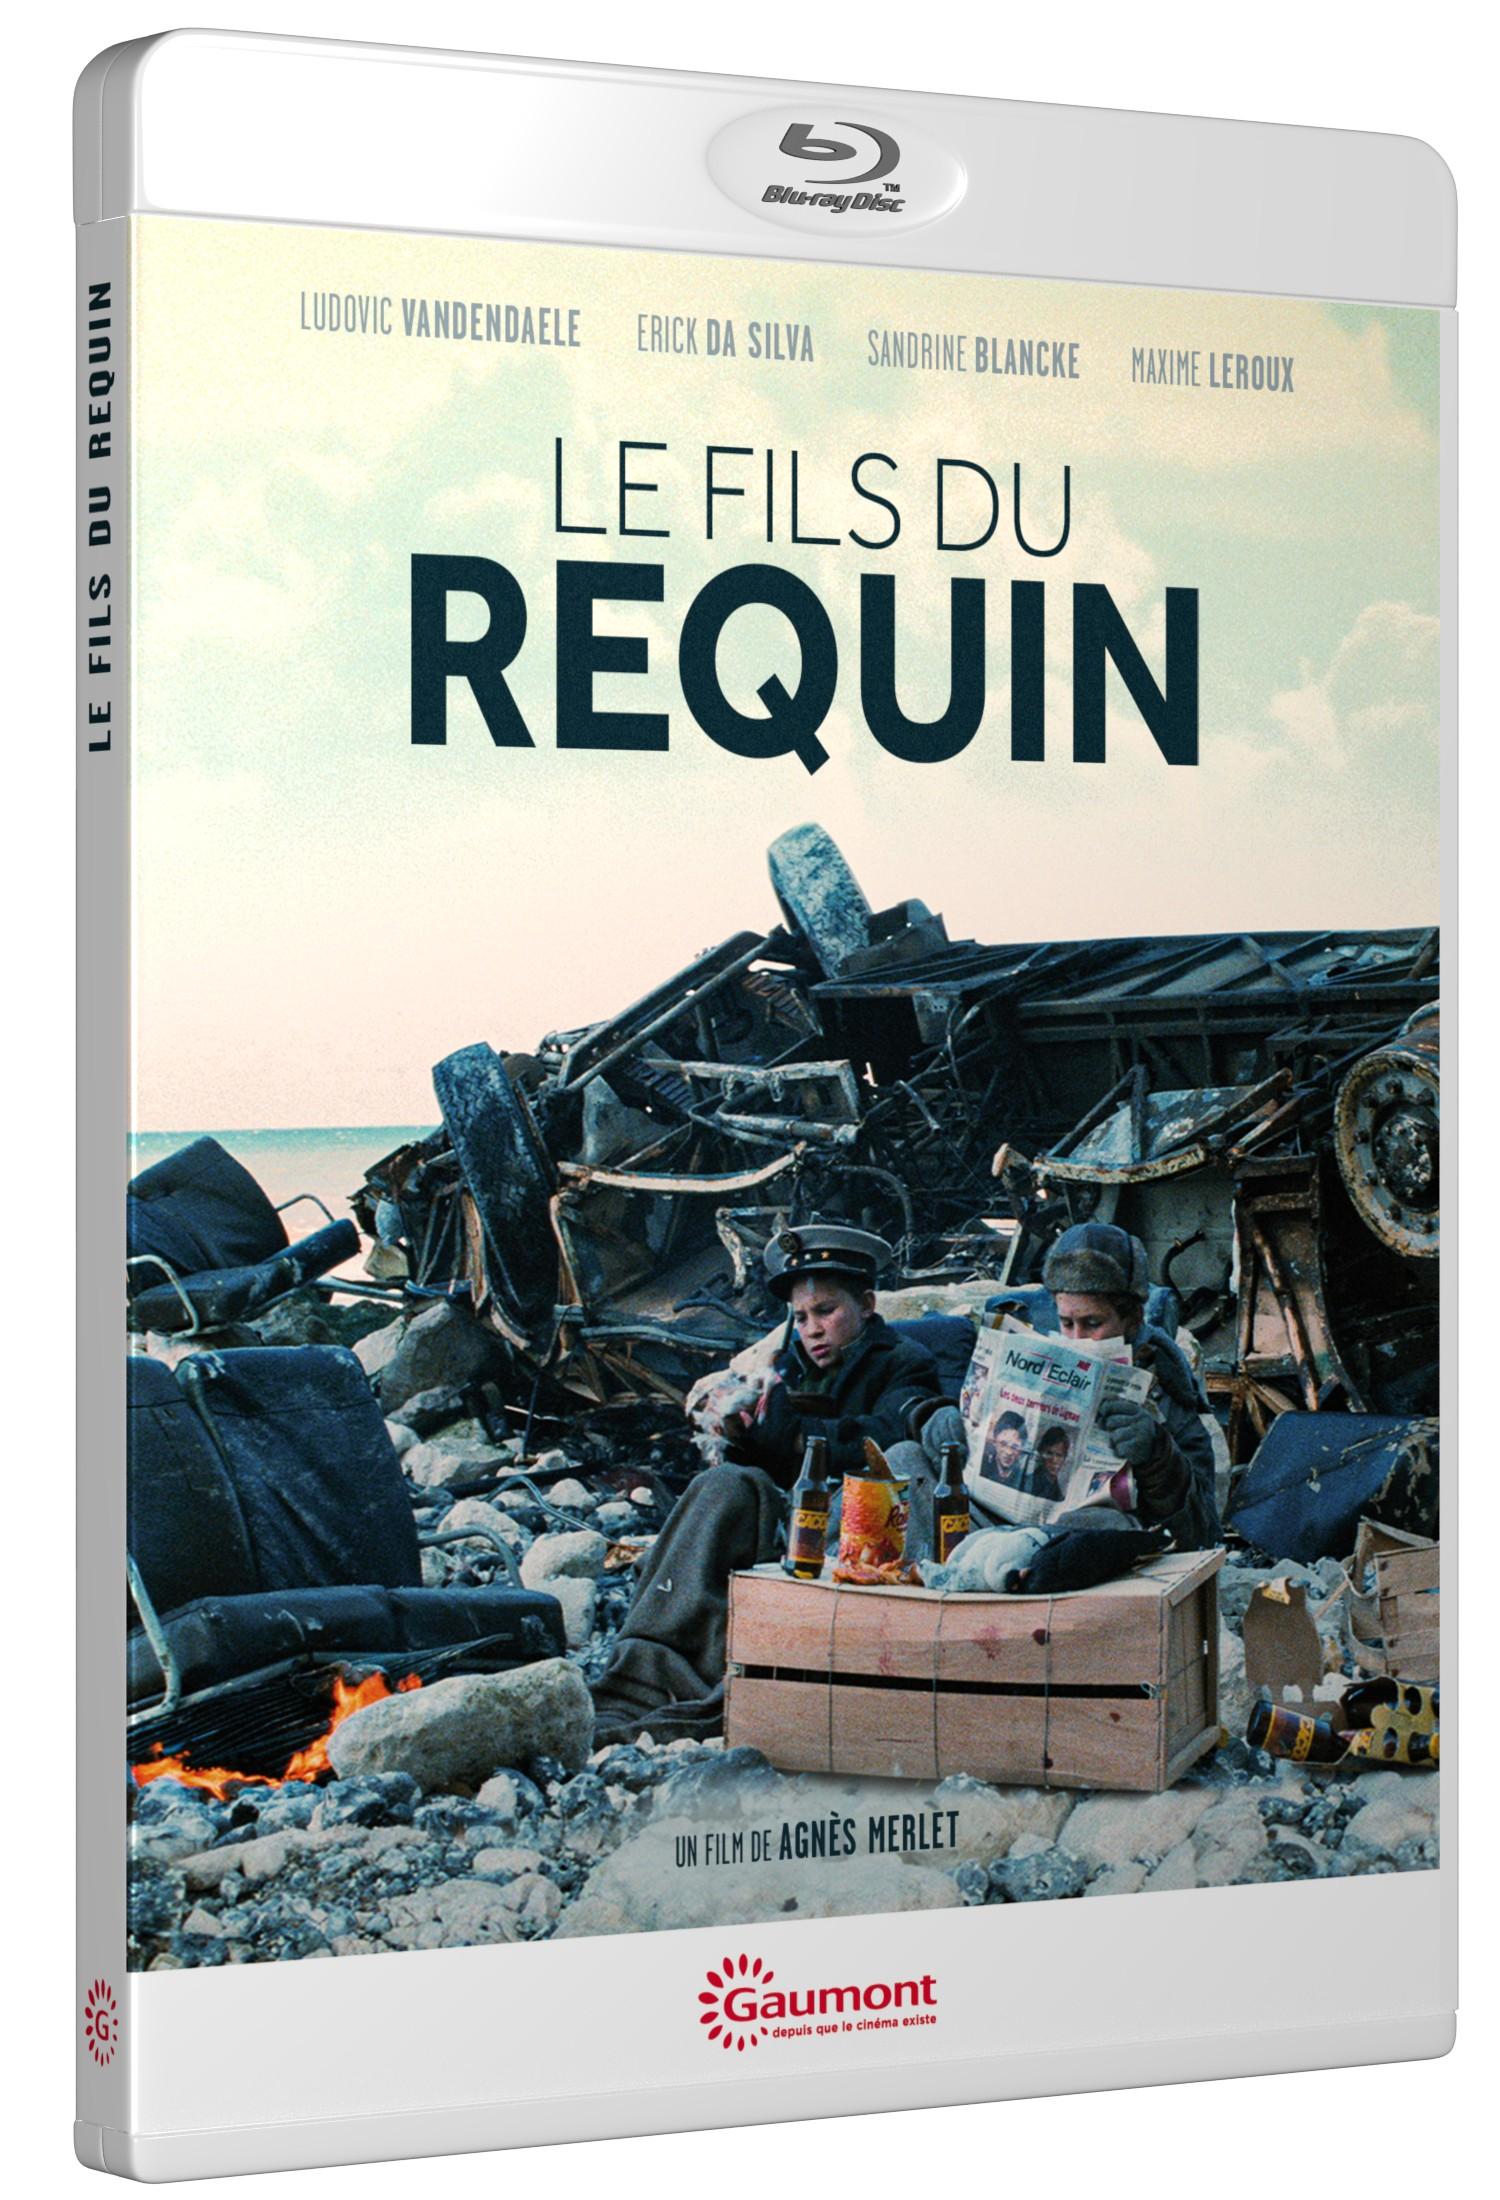 LE FILS DU REQUIN - GDBD - BRD